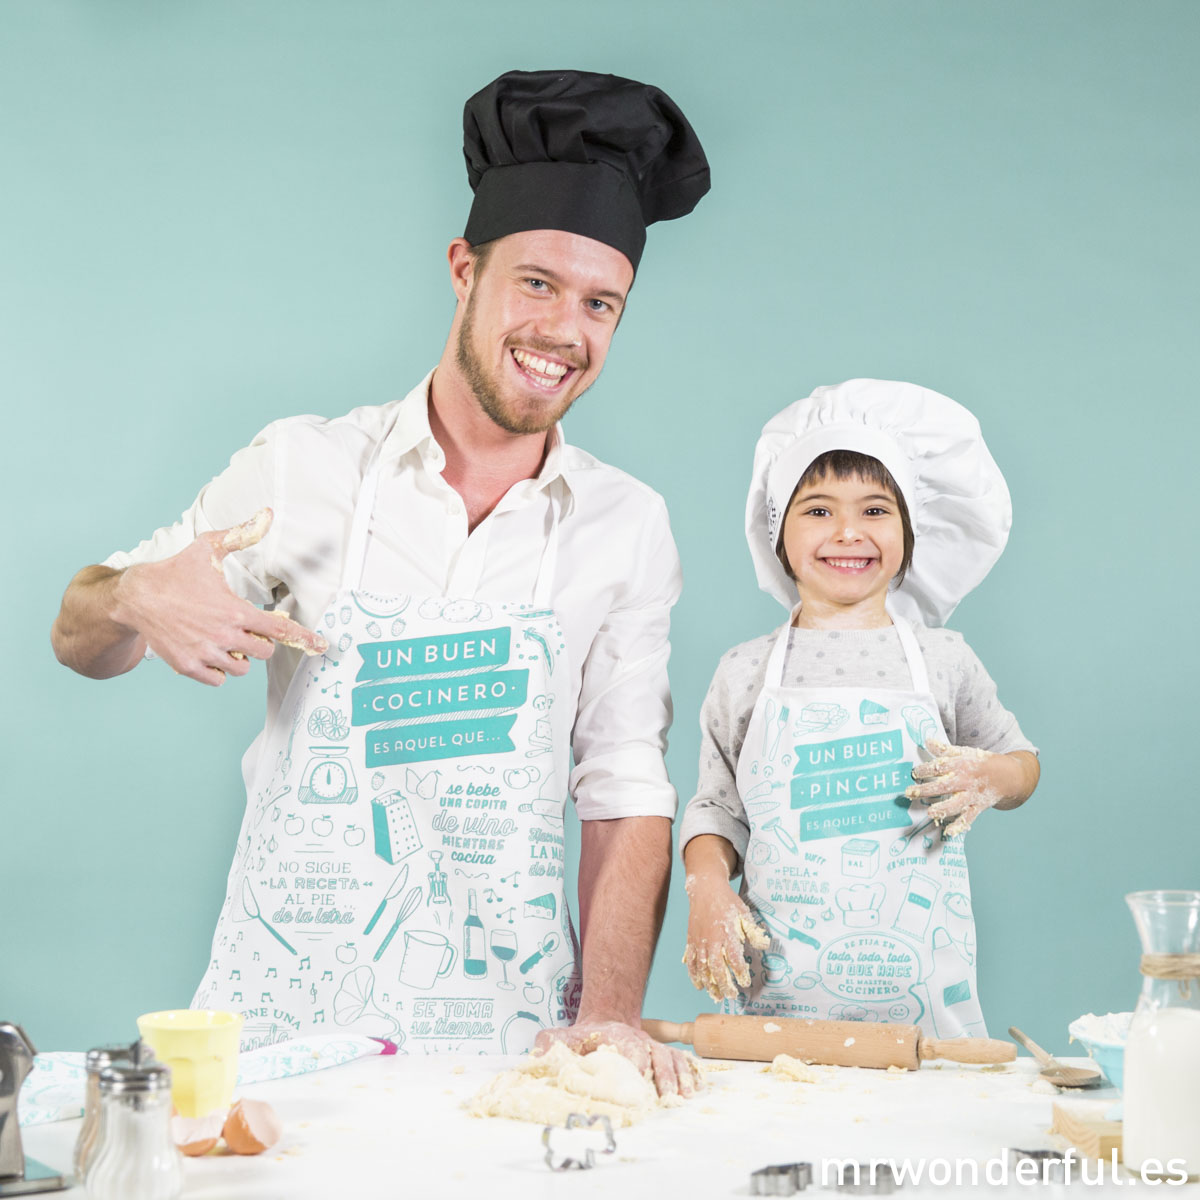 mrwonderful_DELANTAL01-DELANTAL03_Davantal-Adult-Cocinero-ROSA_Pinche-Verde-312-Editar